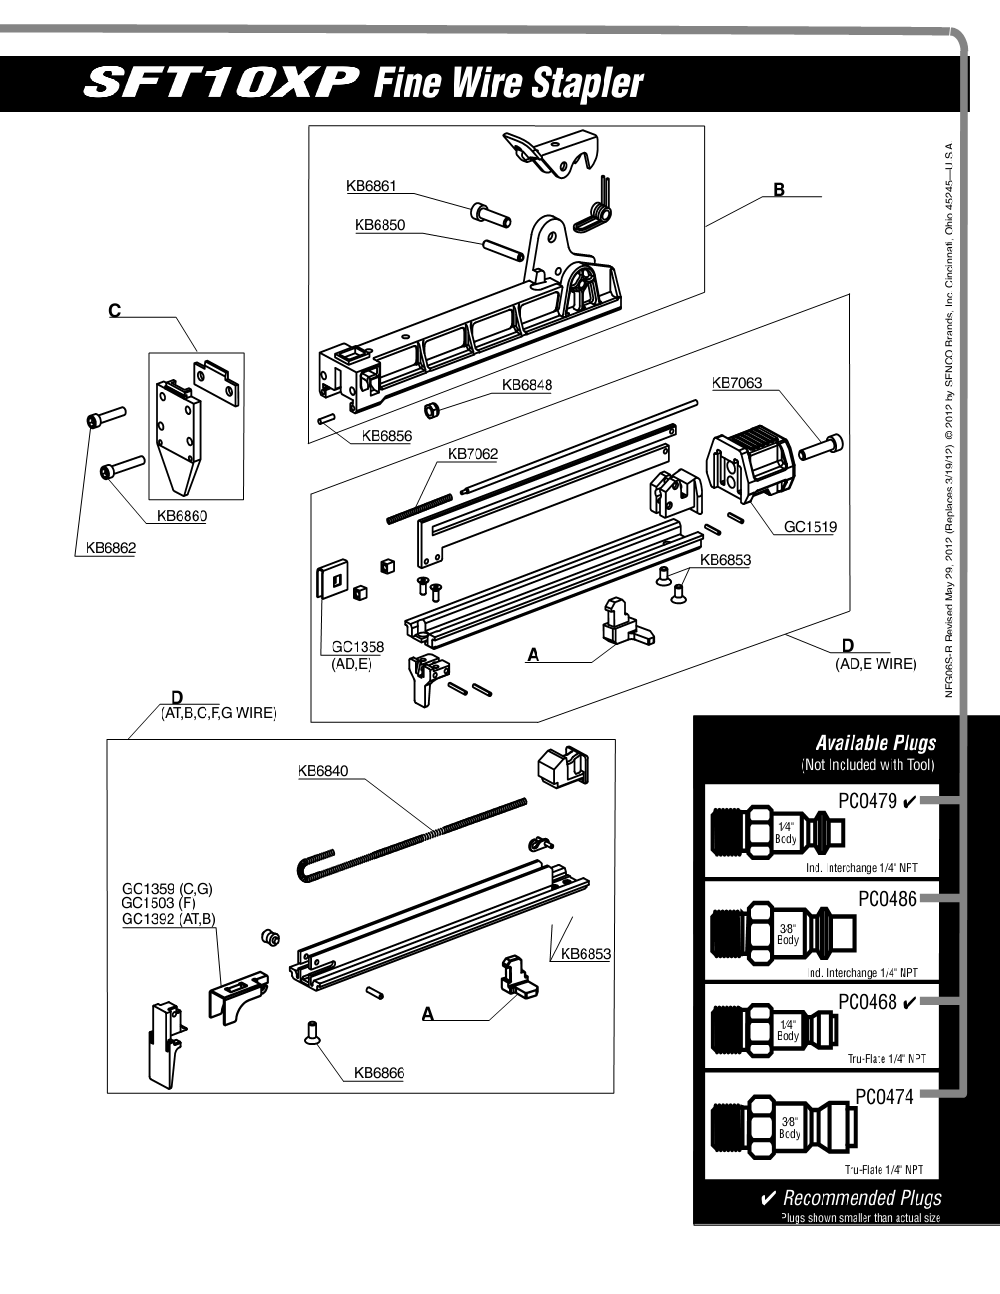 6S0021N-senco-PB-1Break Down